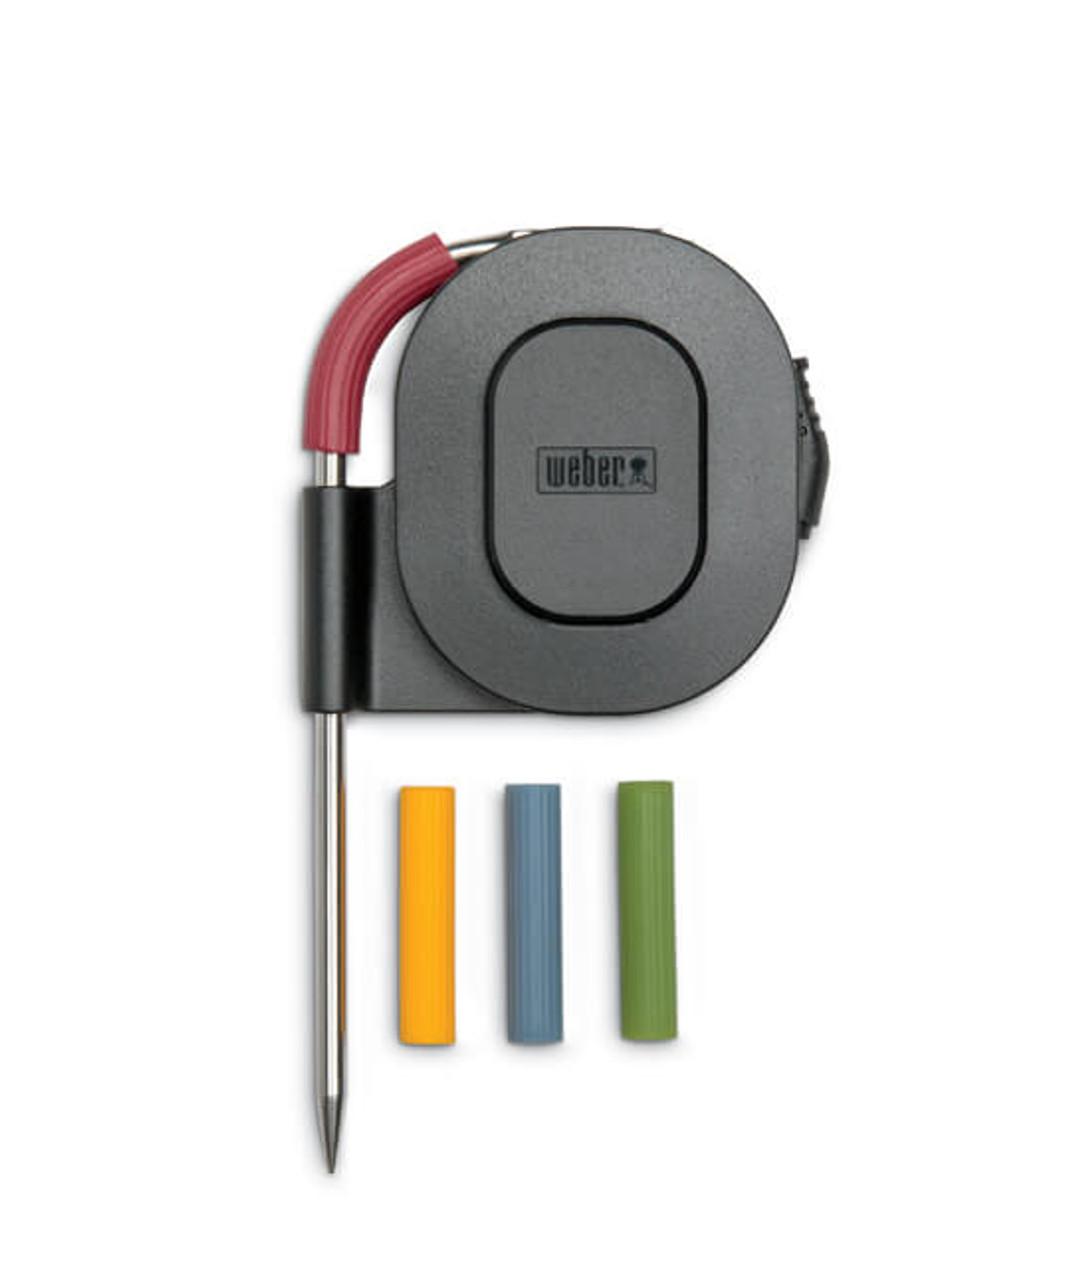 Weber® iGrill Pro Meat Temperature Probe